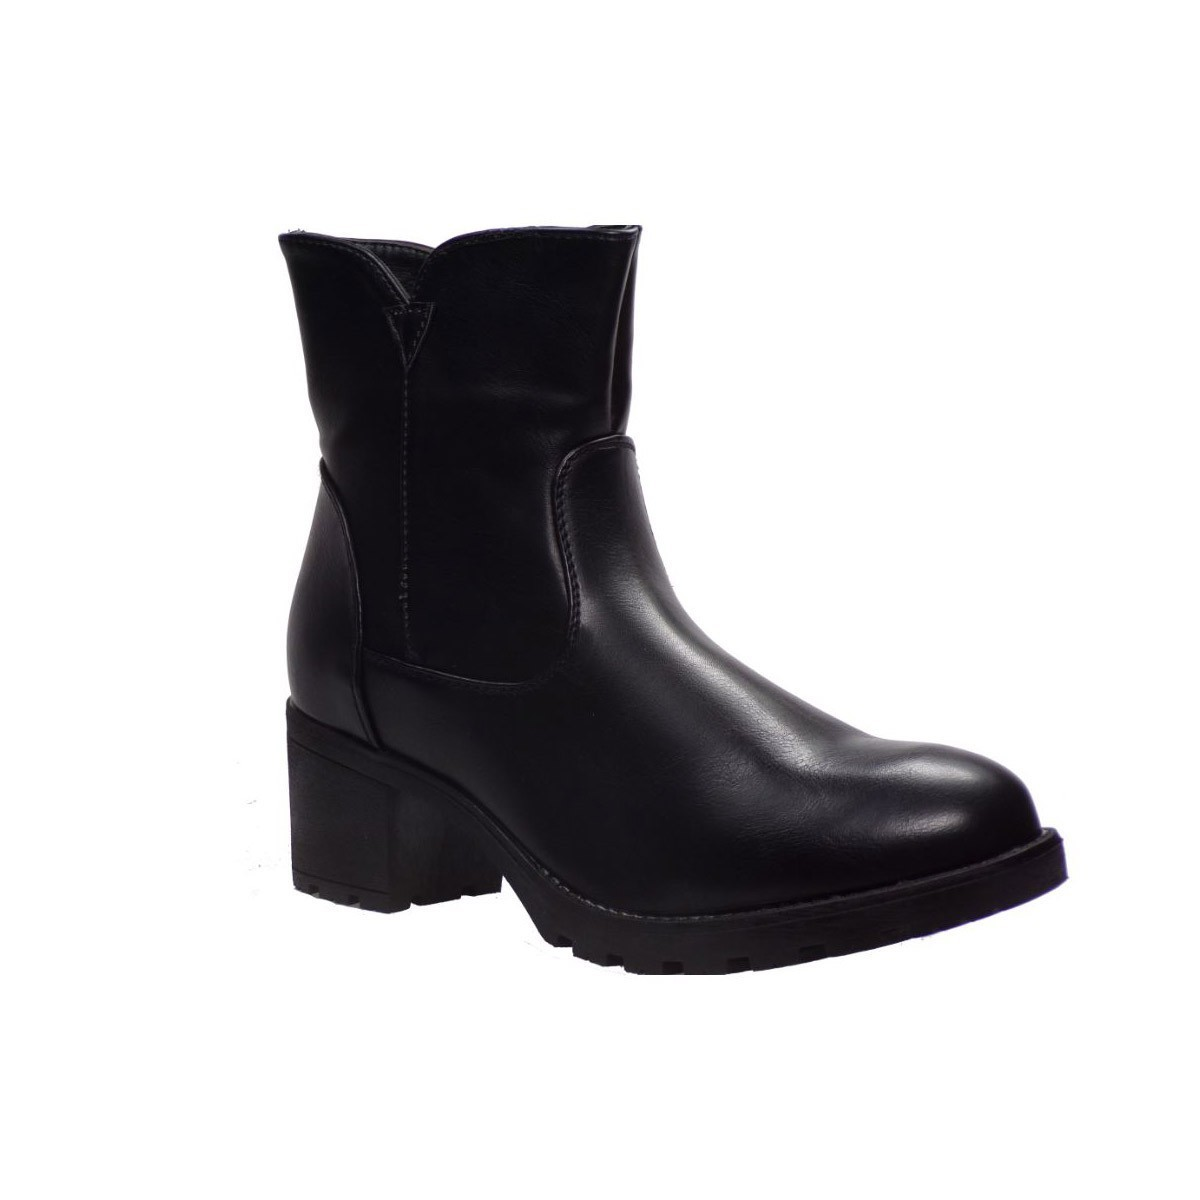 Envie Γυναικεία Παπούτσια Μποτάκια 66-3574 Μαύρο Envie 66-3574 Μ